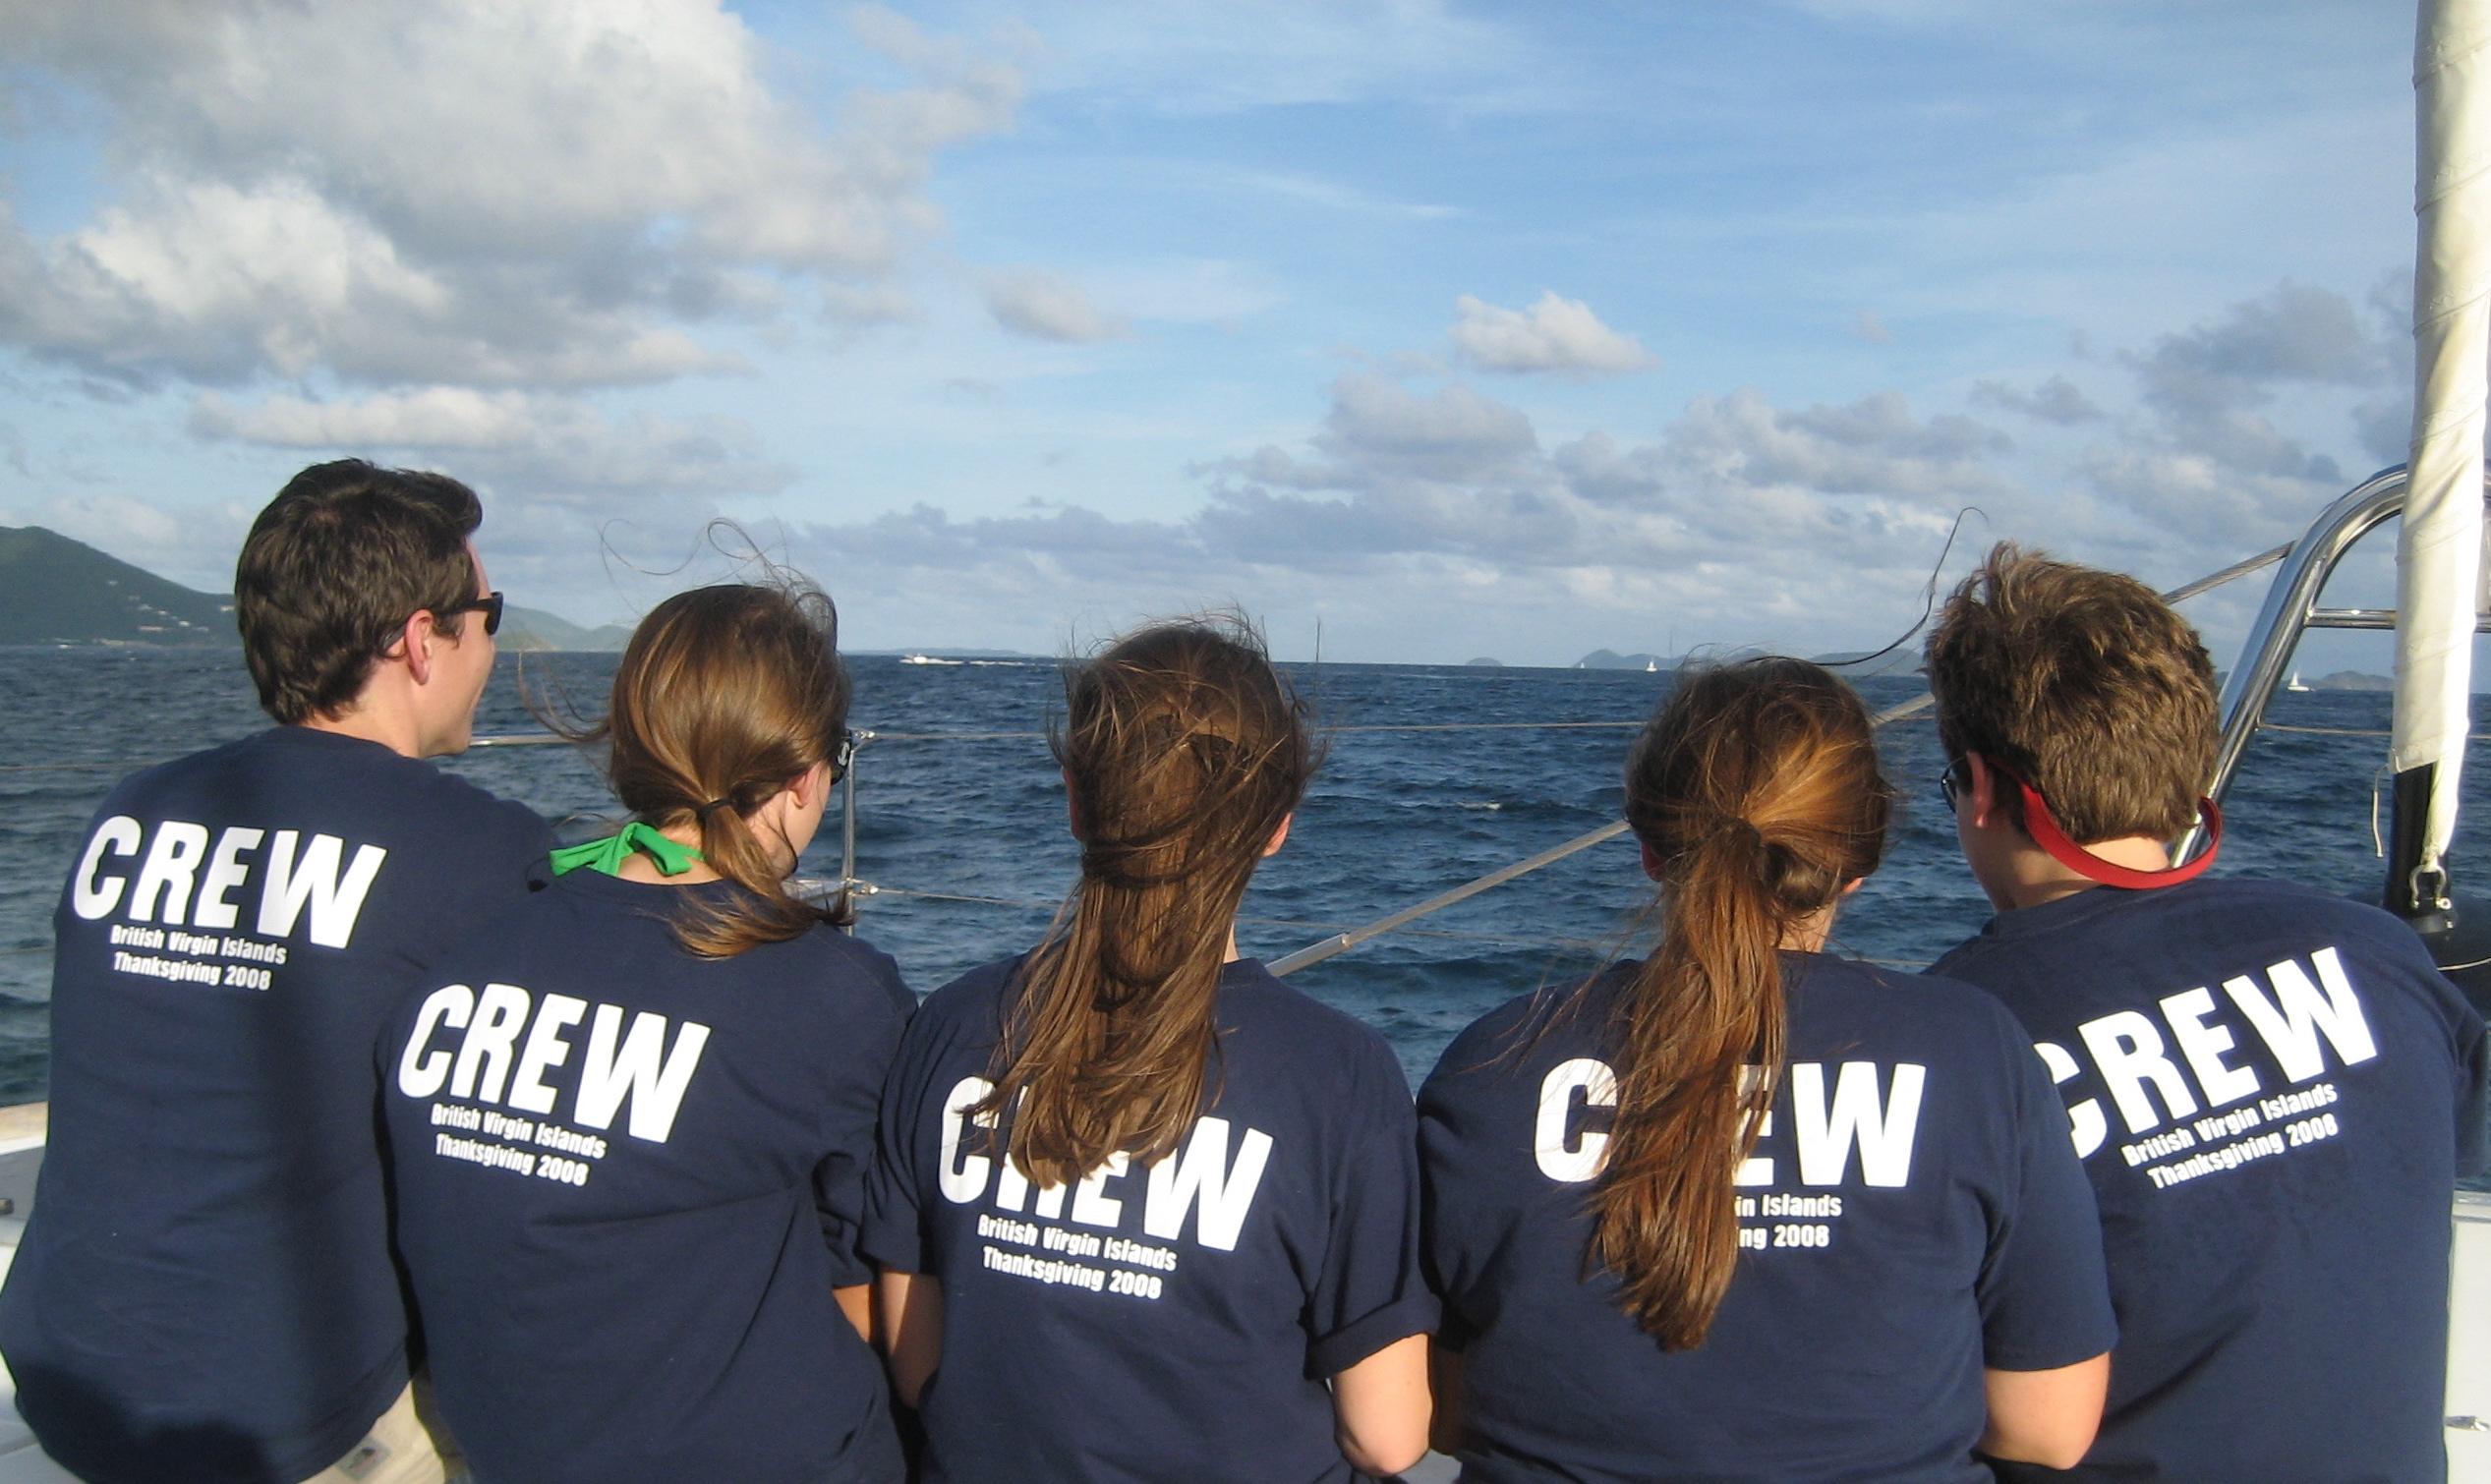 Design your own t-shirt hanes - Kobs Closuit British Virgin Islands Sailing Trip 2008 T Shirt Photo